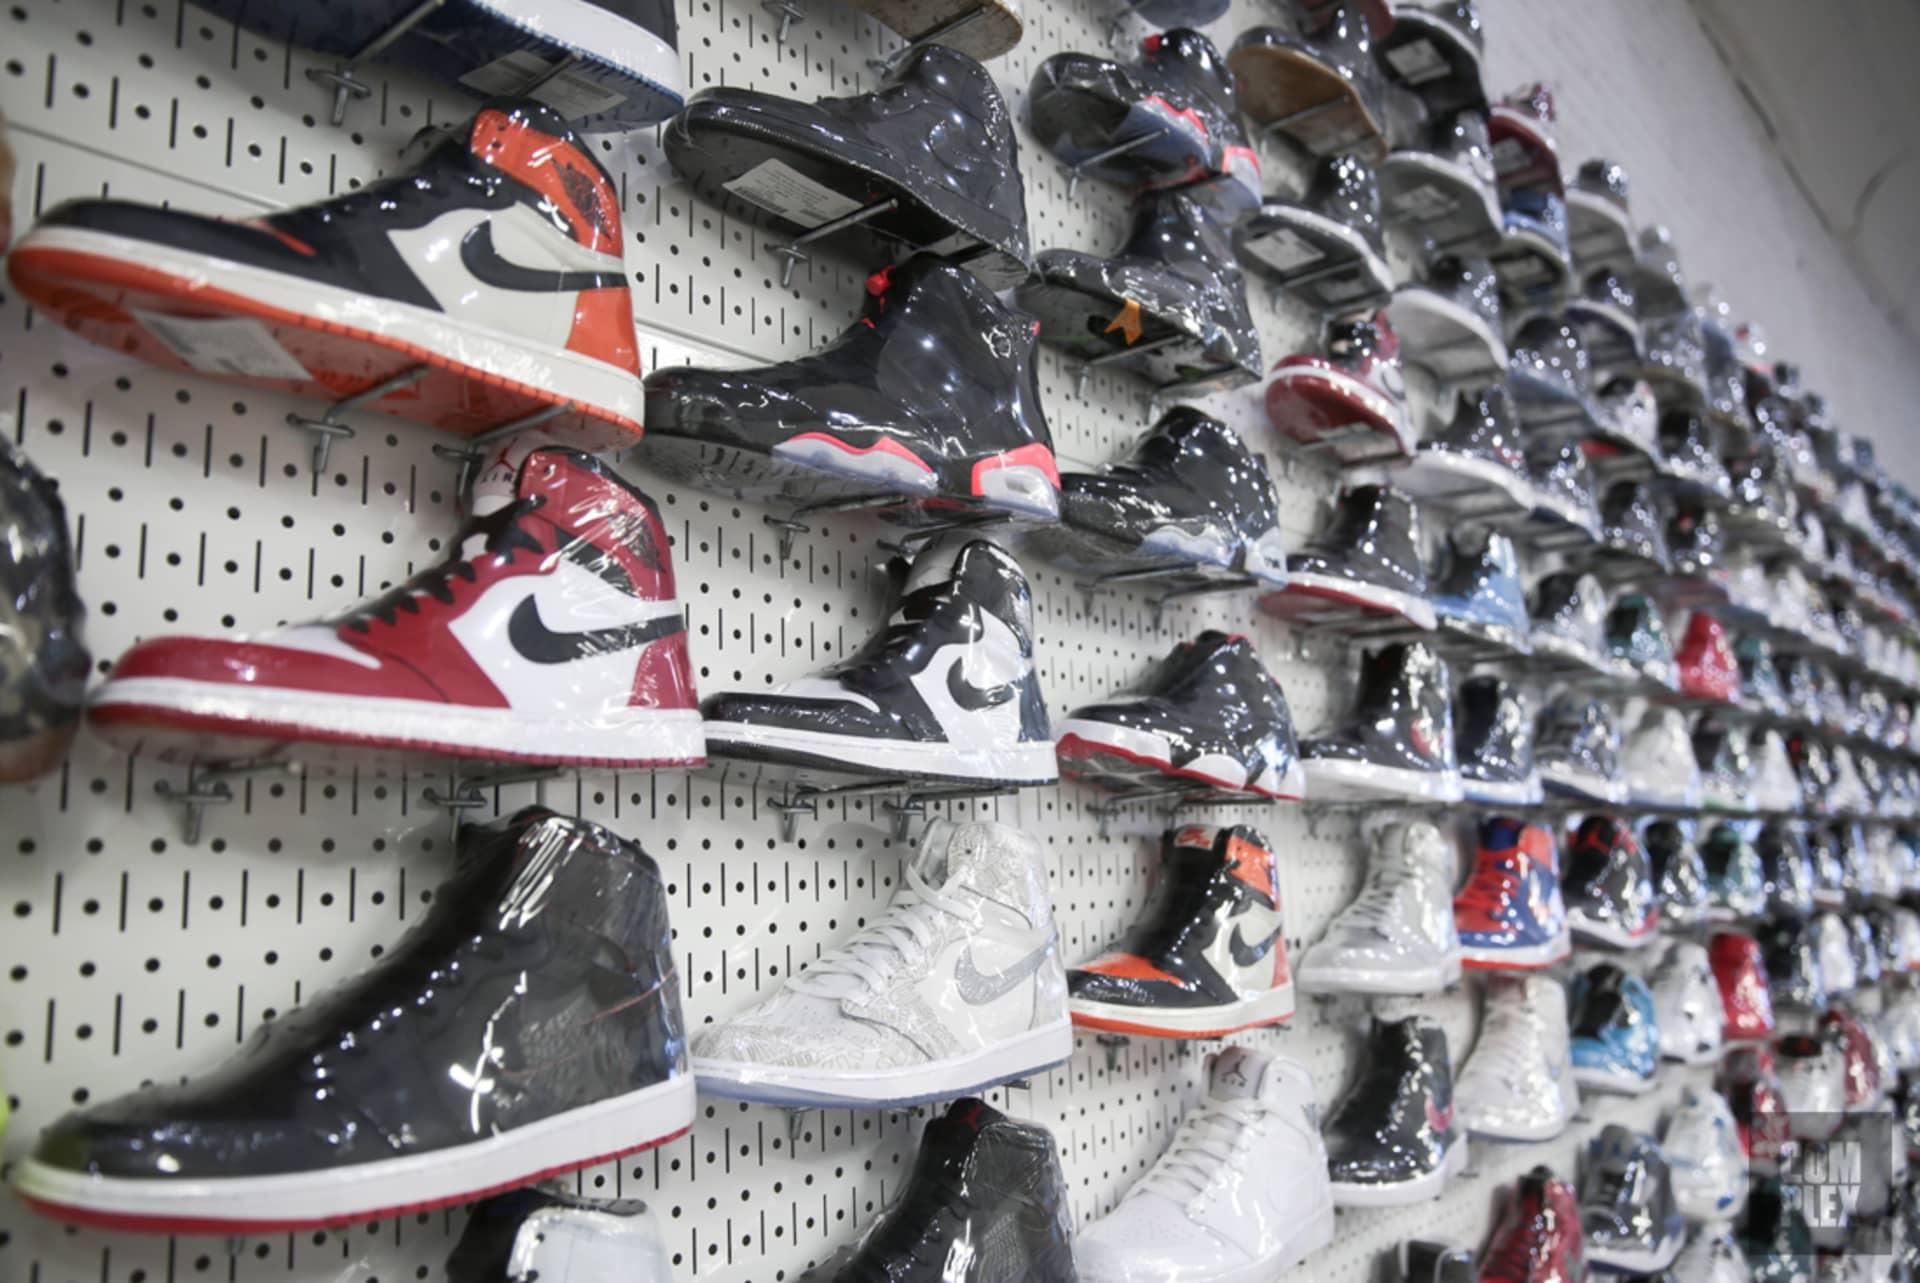 e17d2fe1fcf7af Grail Status - Sneaker History